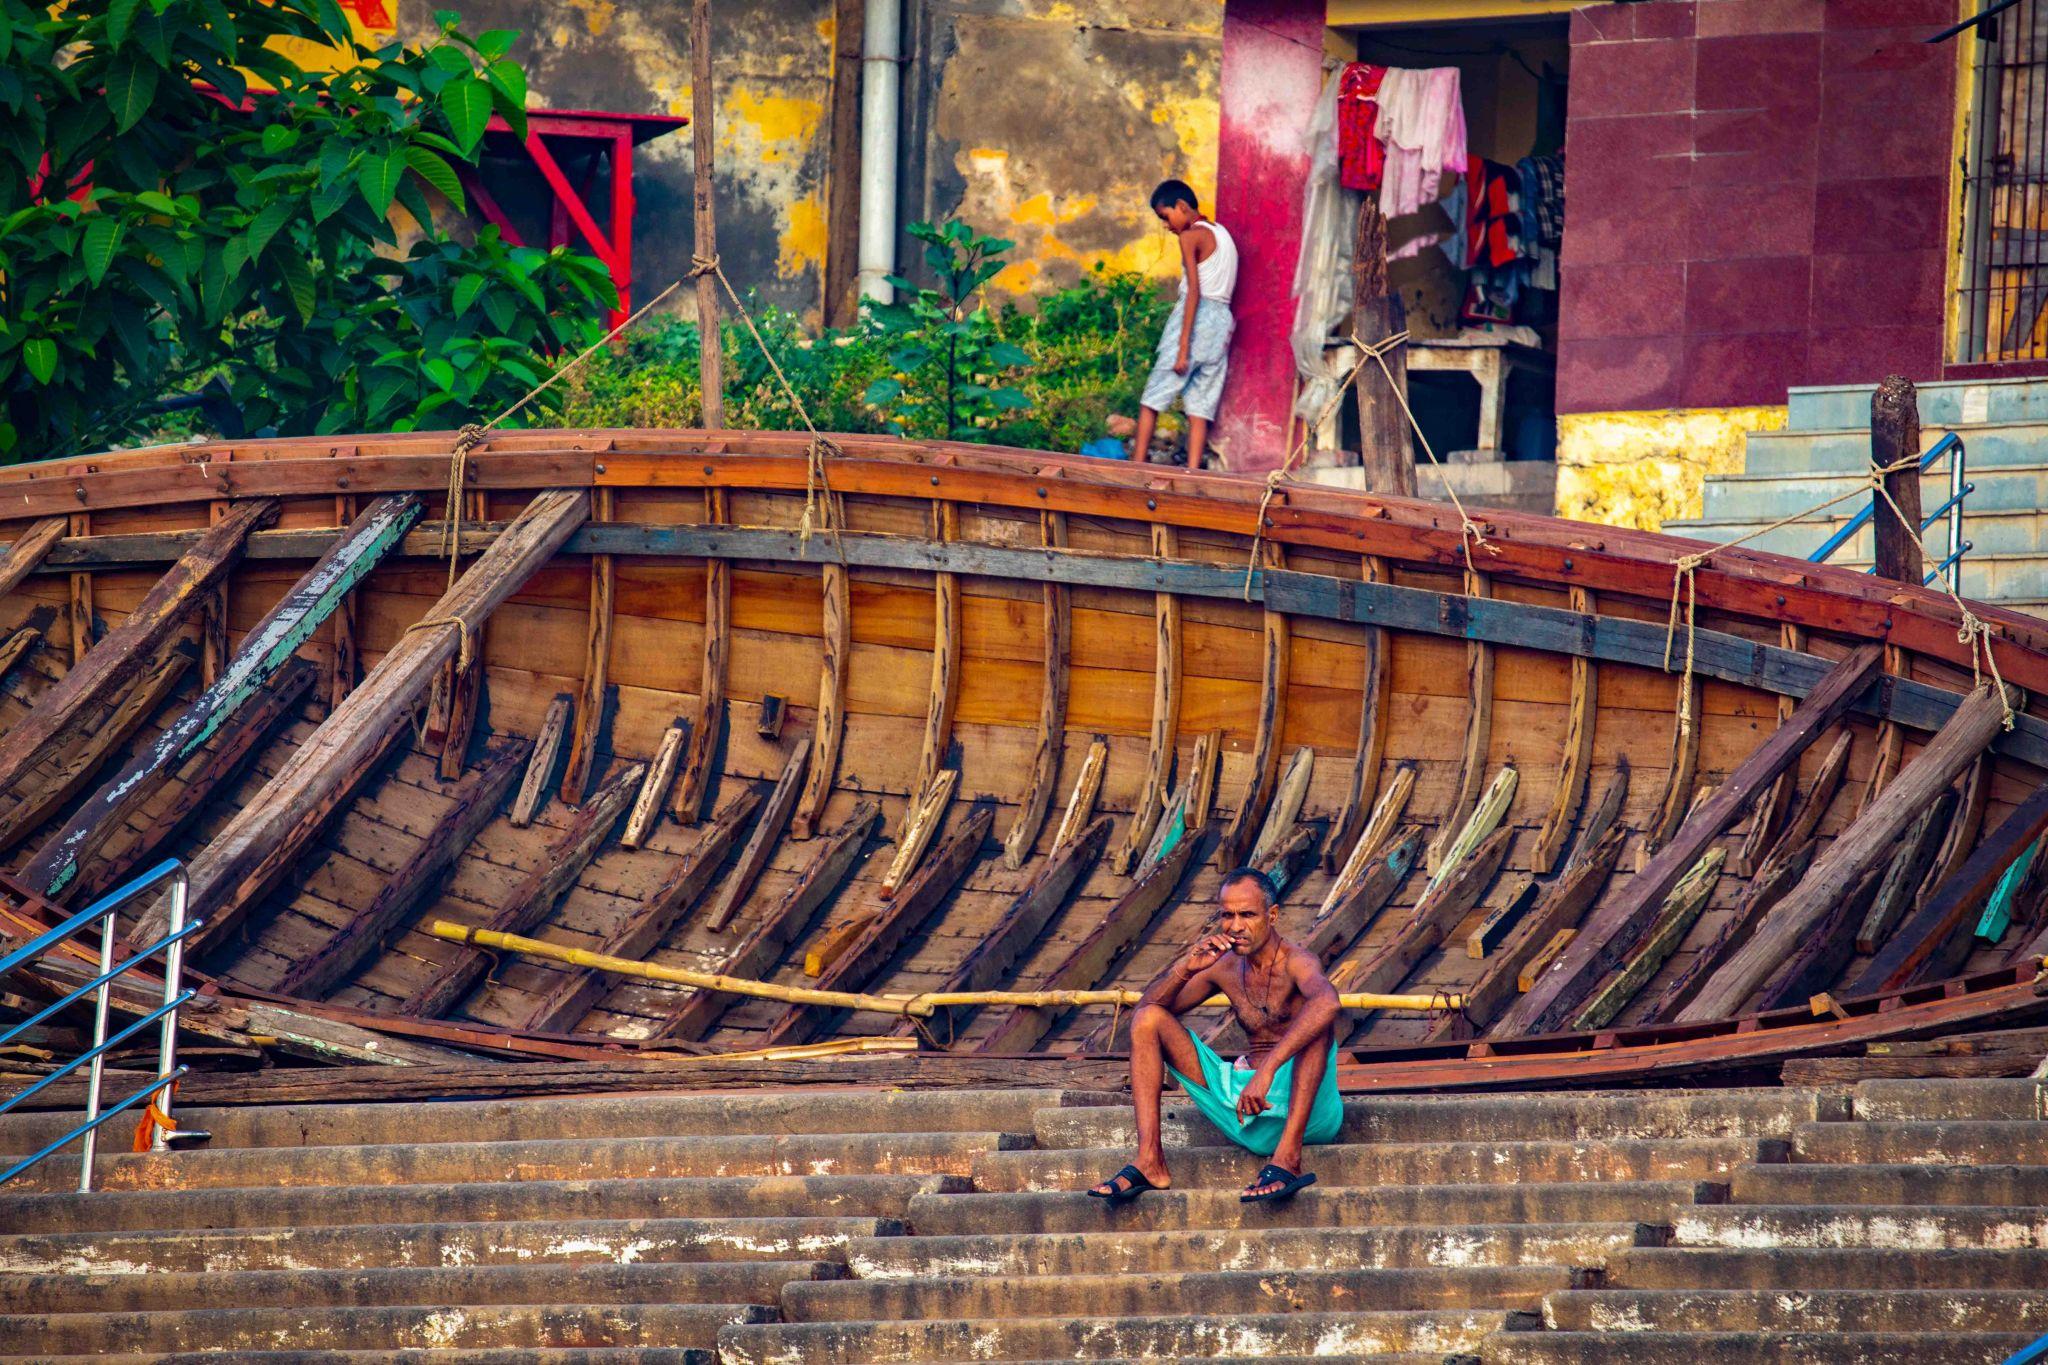 The boat skeleton the Ganges Varanasi, India